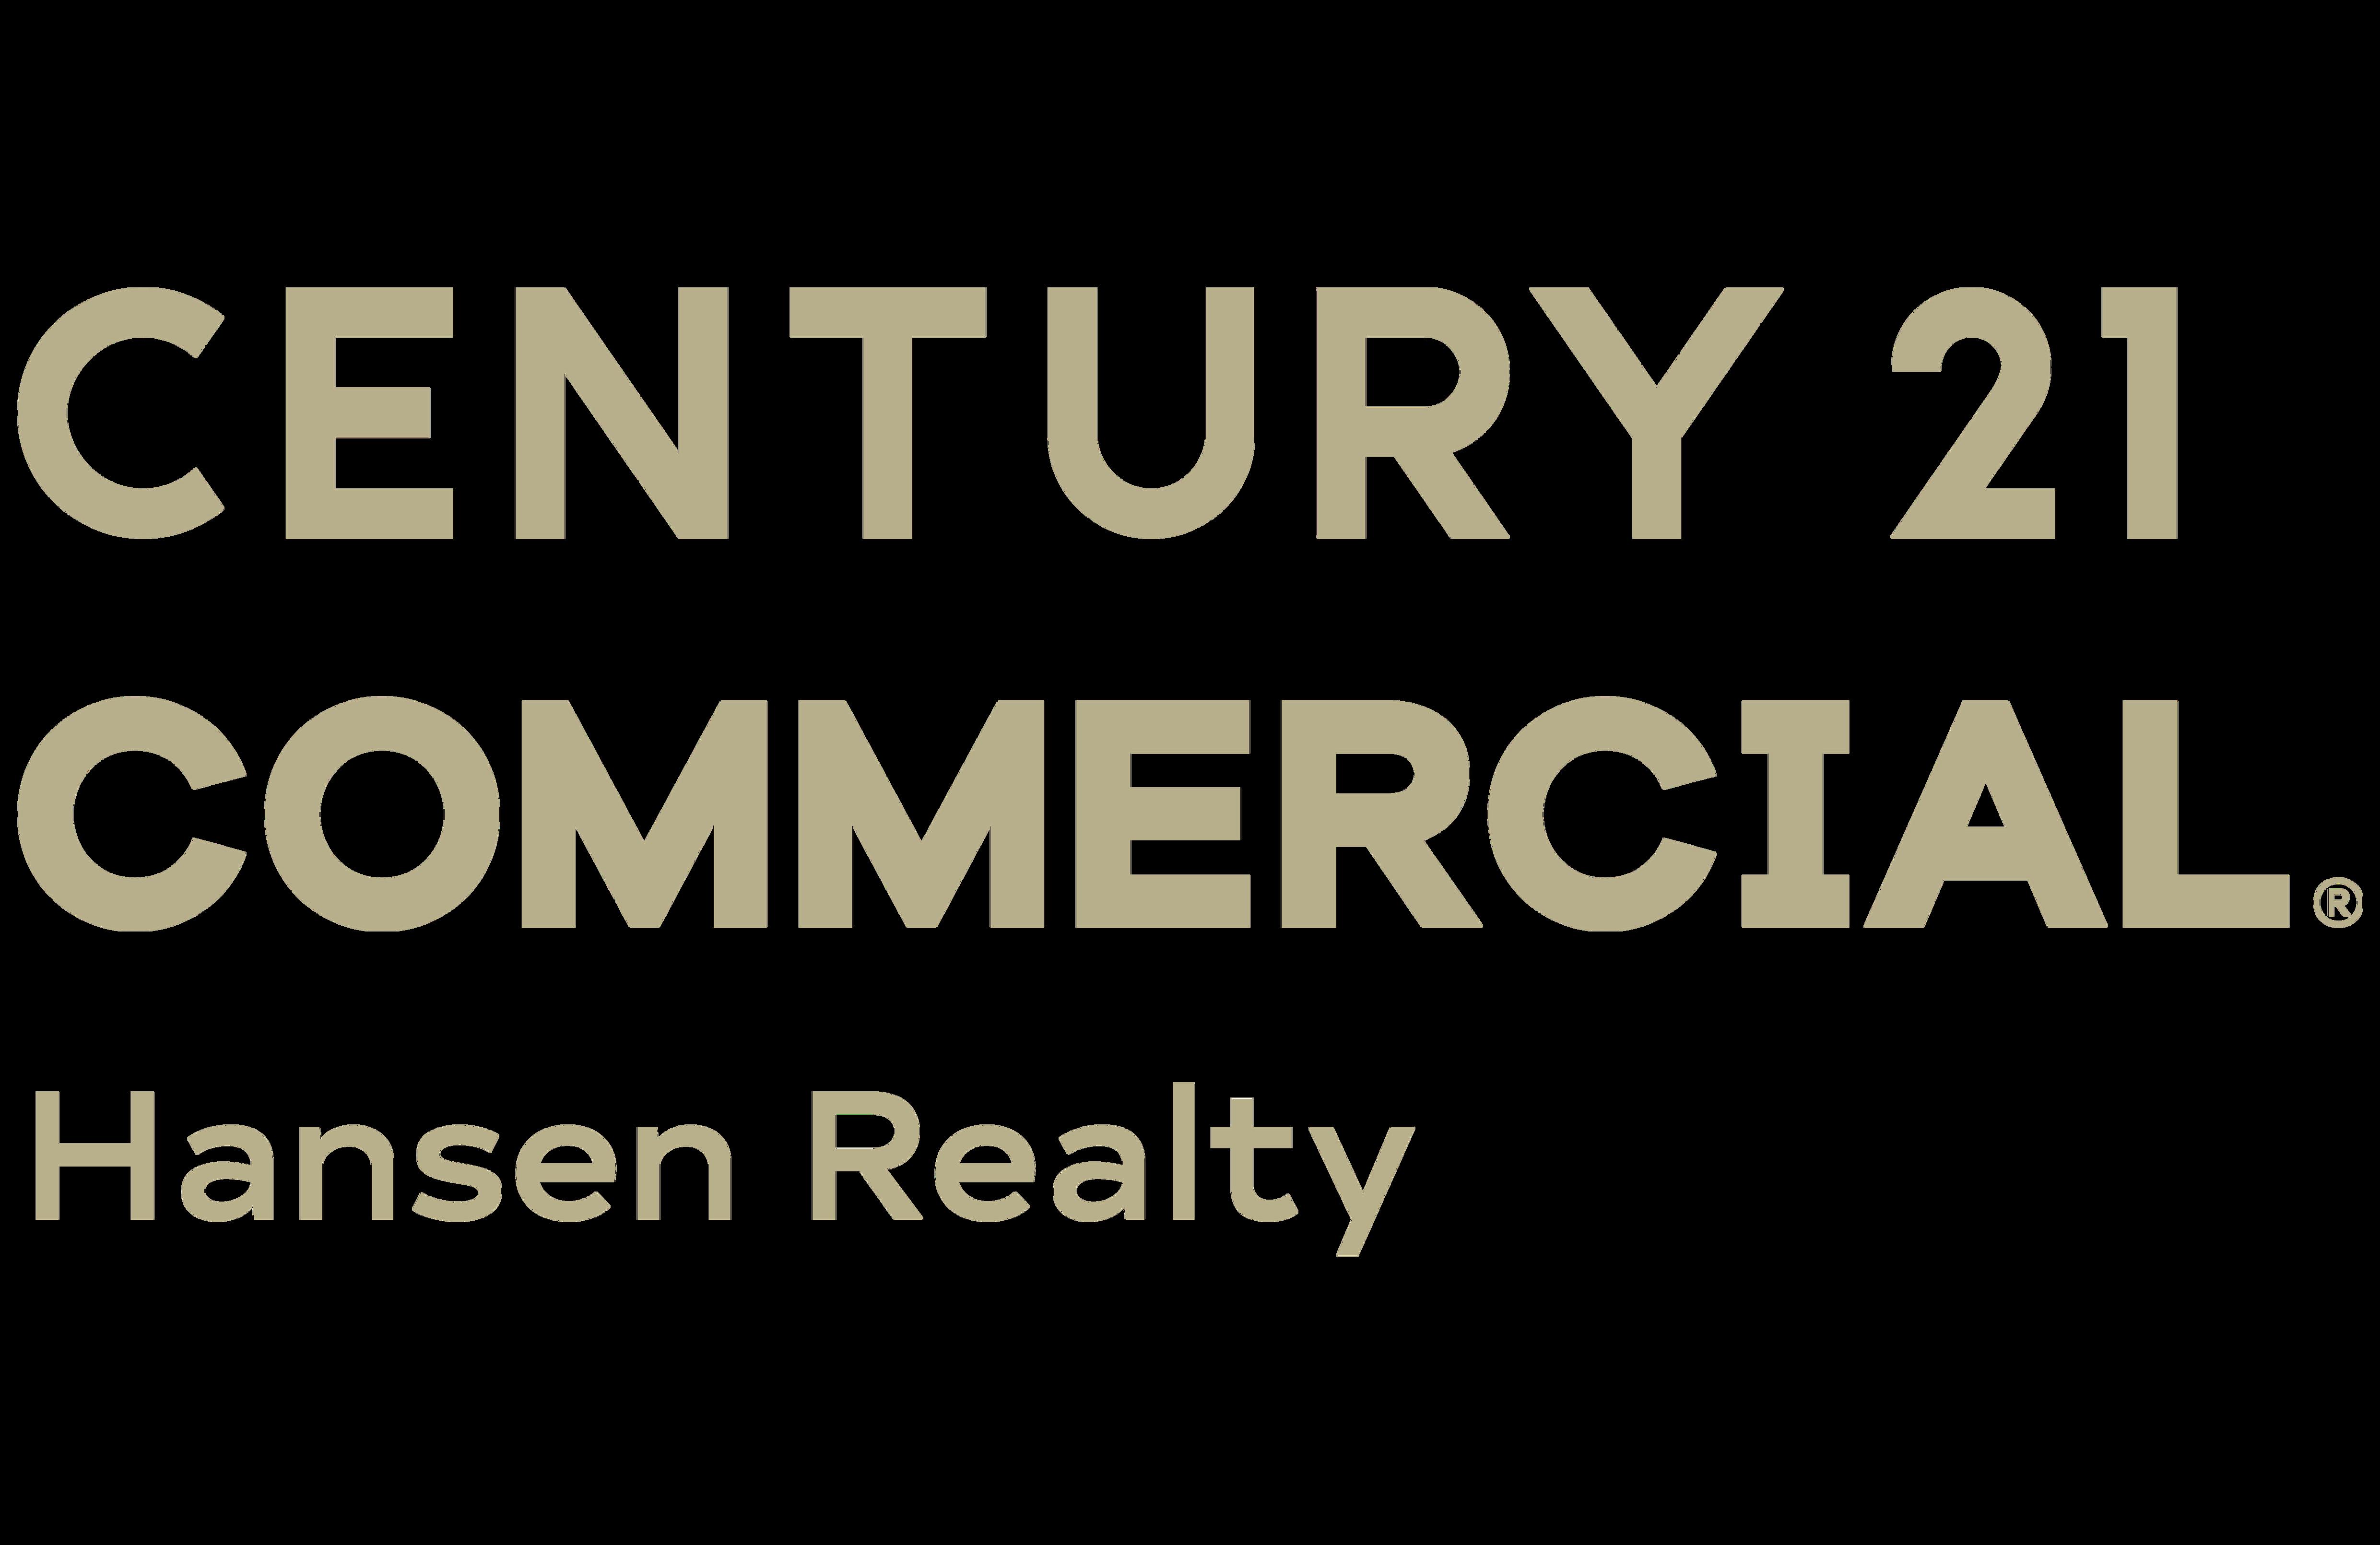 Jim Demarest of CENTURY 21 Hansen Realty logo